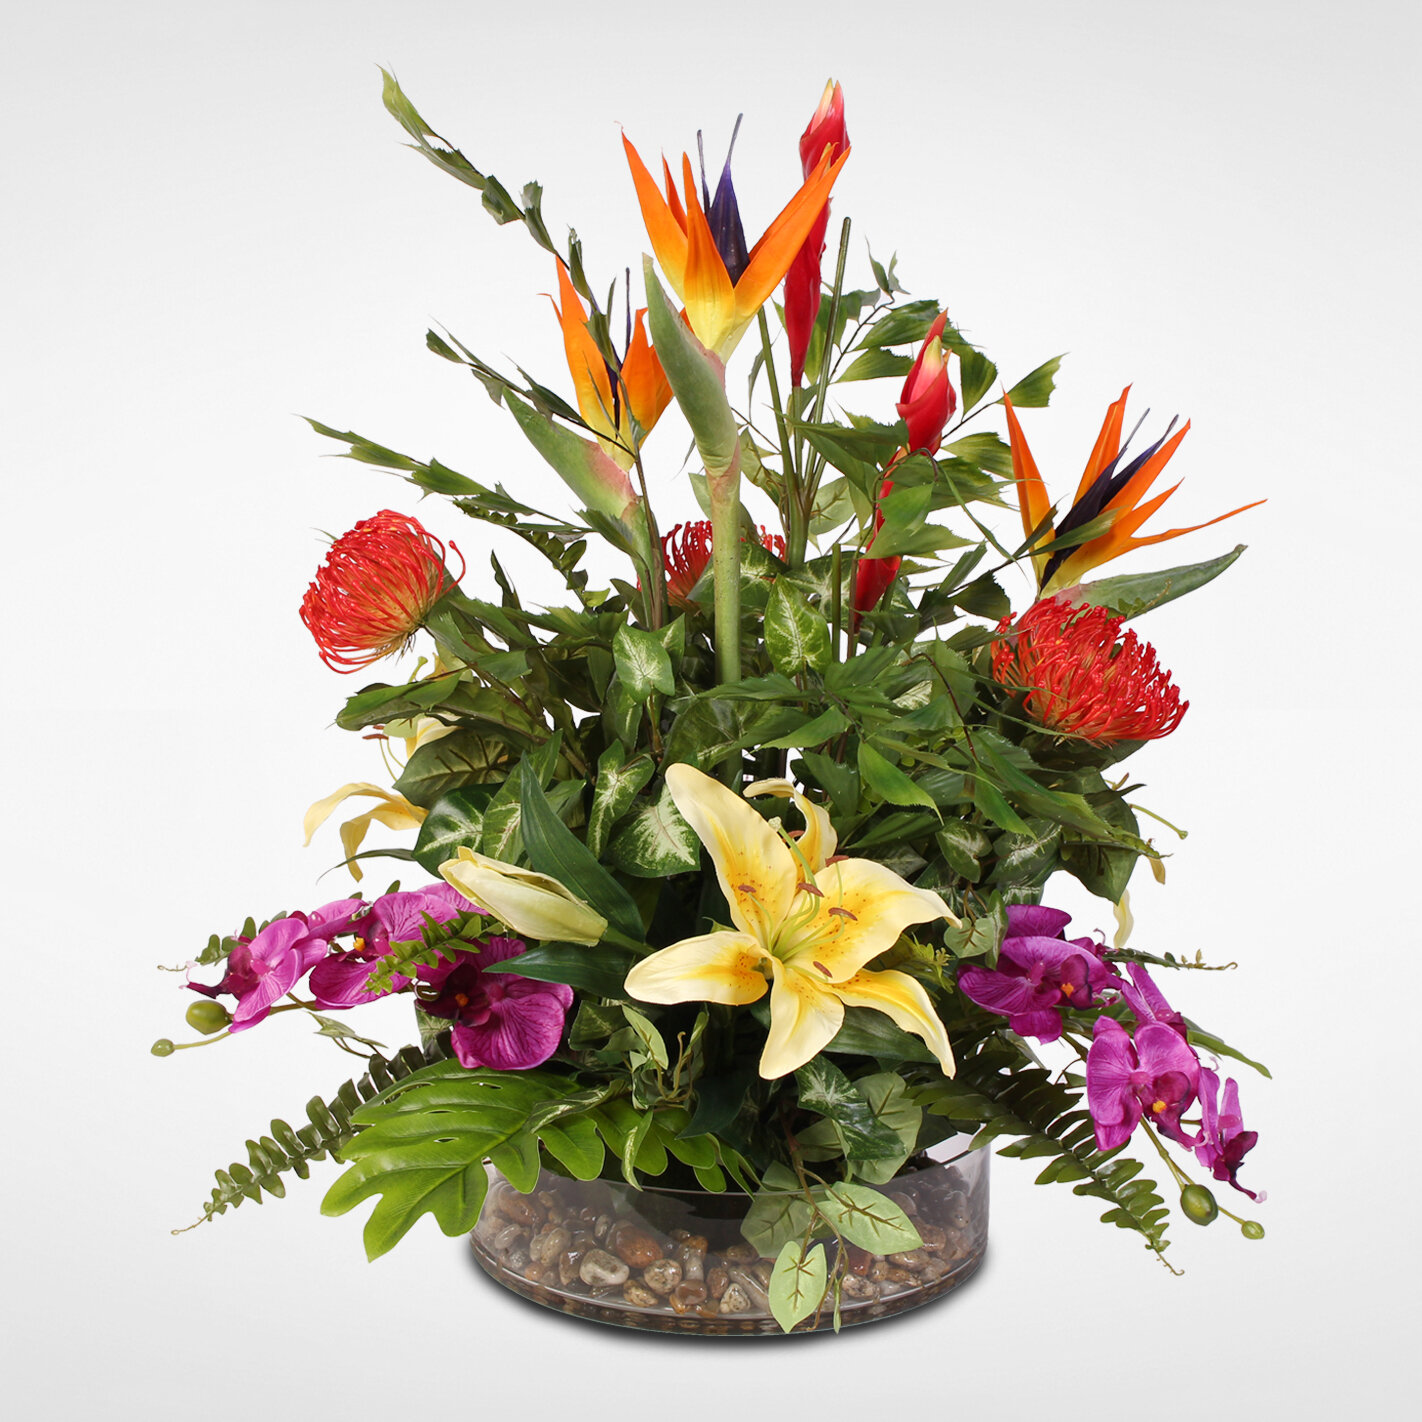 Jennysilks Exotic Tropical Silk Mixed Floral Arrangement In Glass Bowl Reviews Wayfair